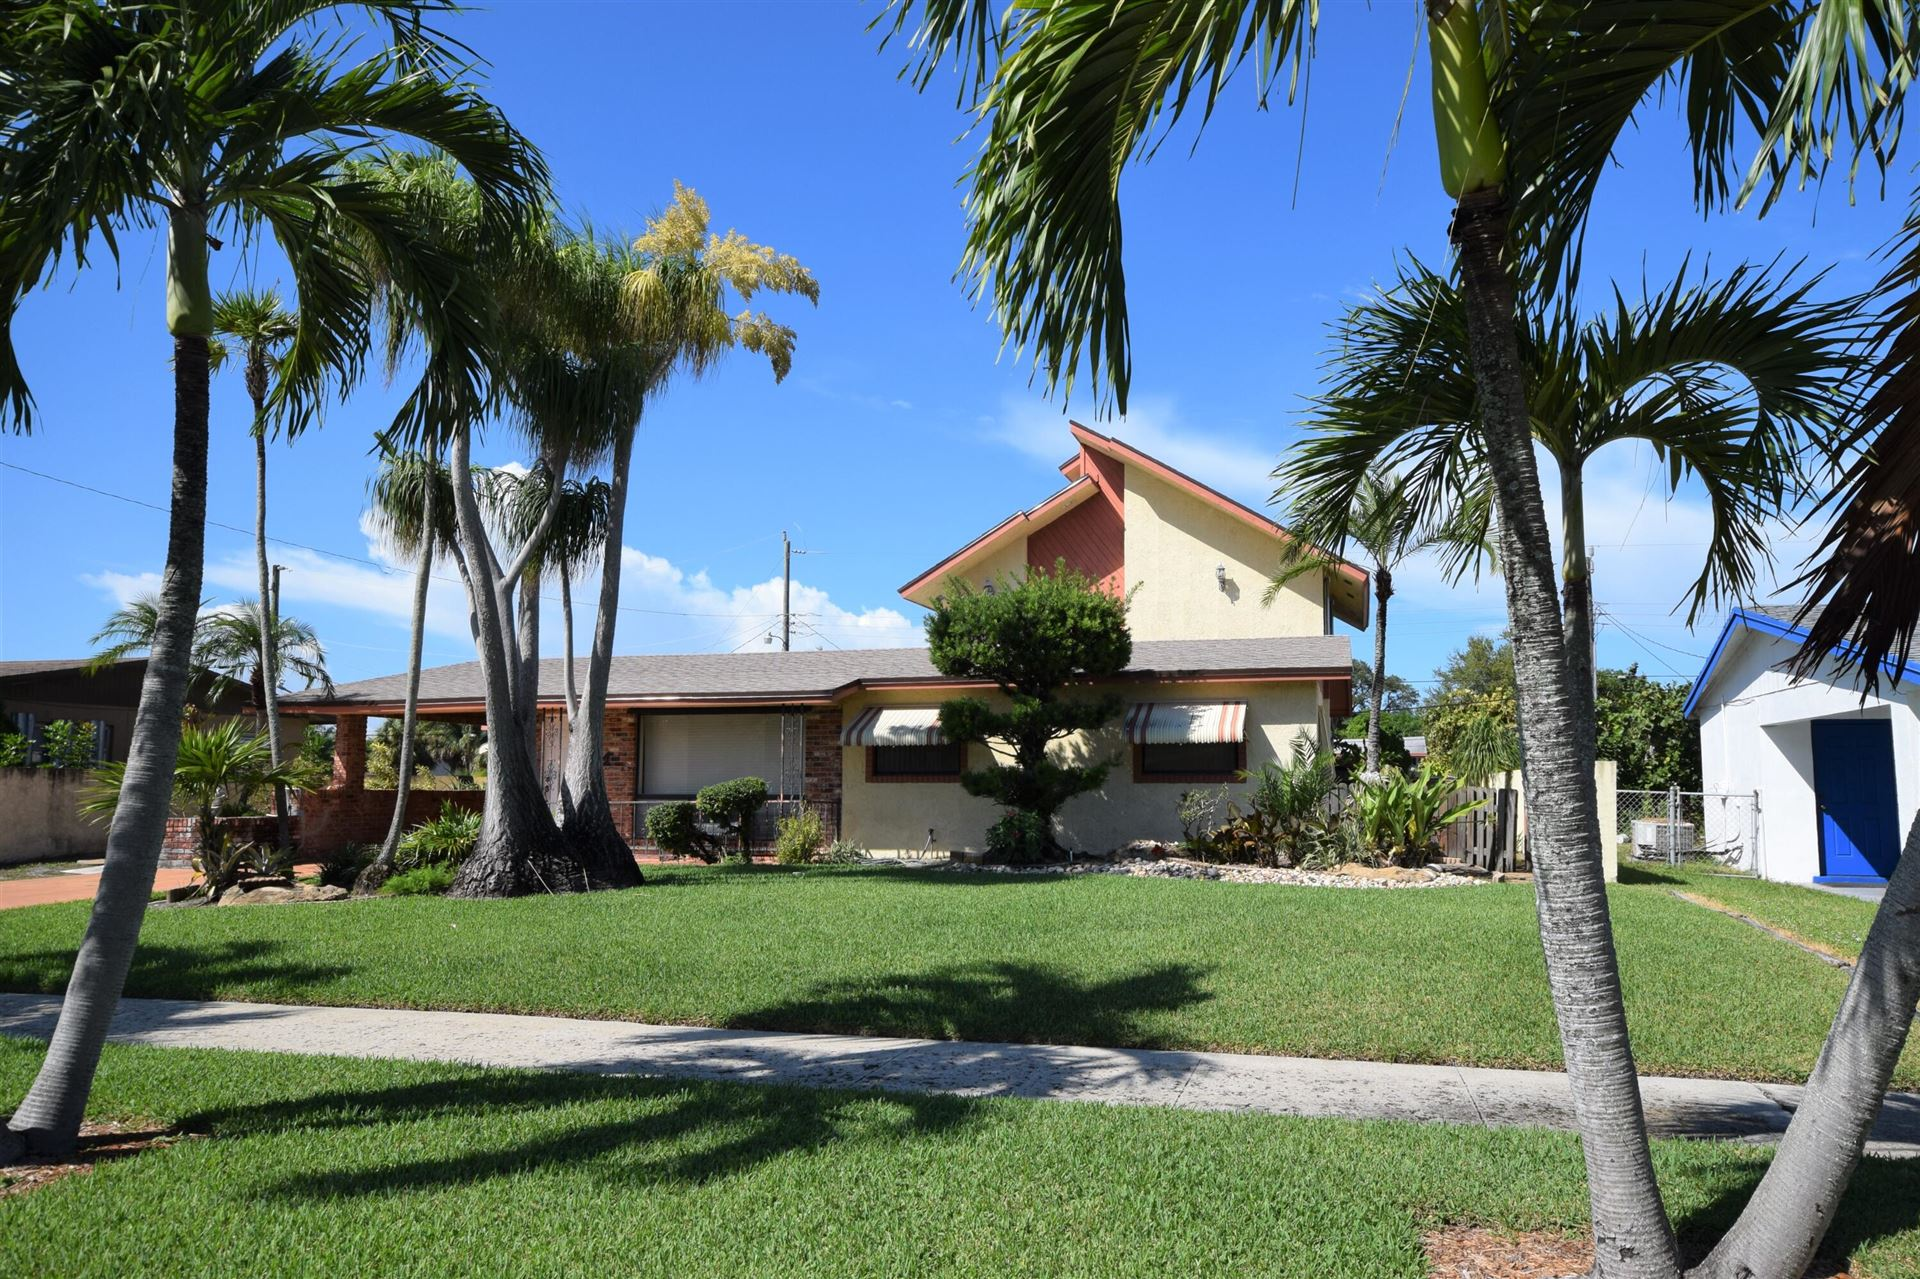 Photo of 129 NE 5th Street, Deerfield Beach, FL 33441 (MLS # RX-10751597)